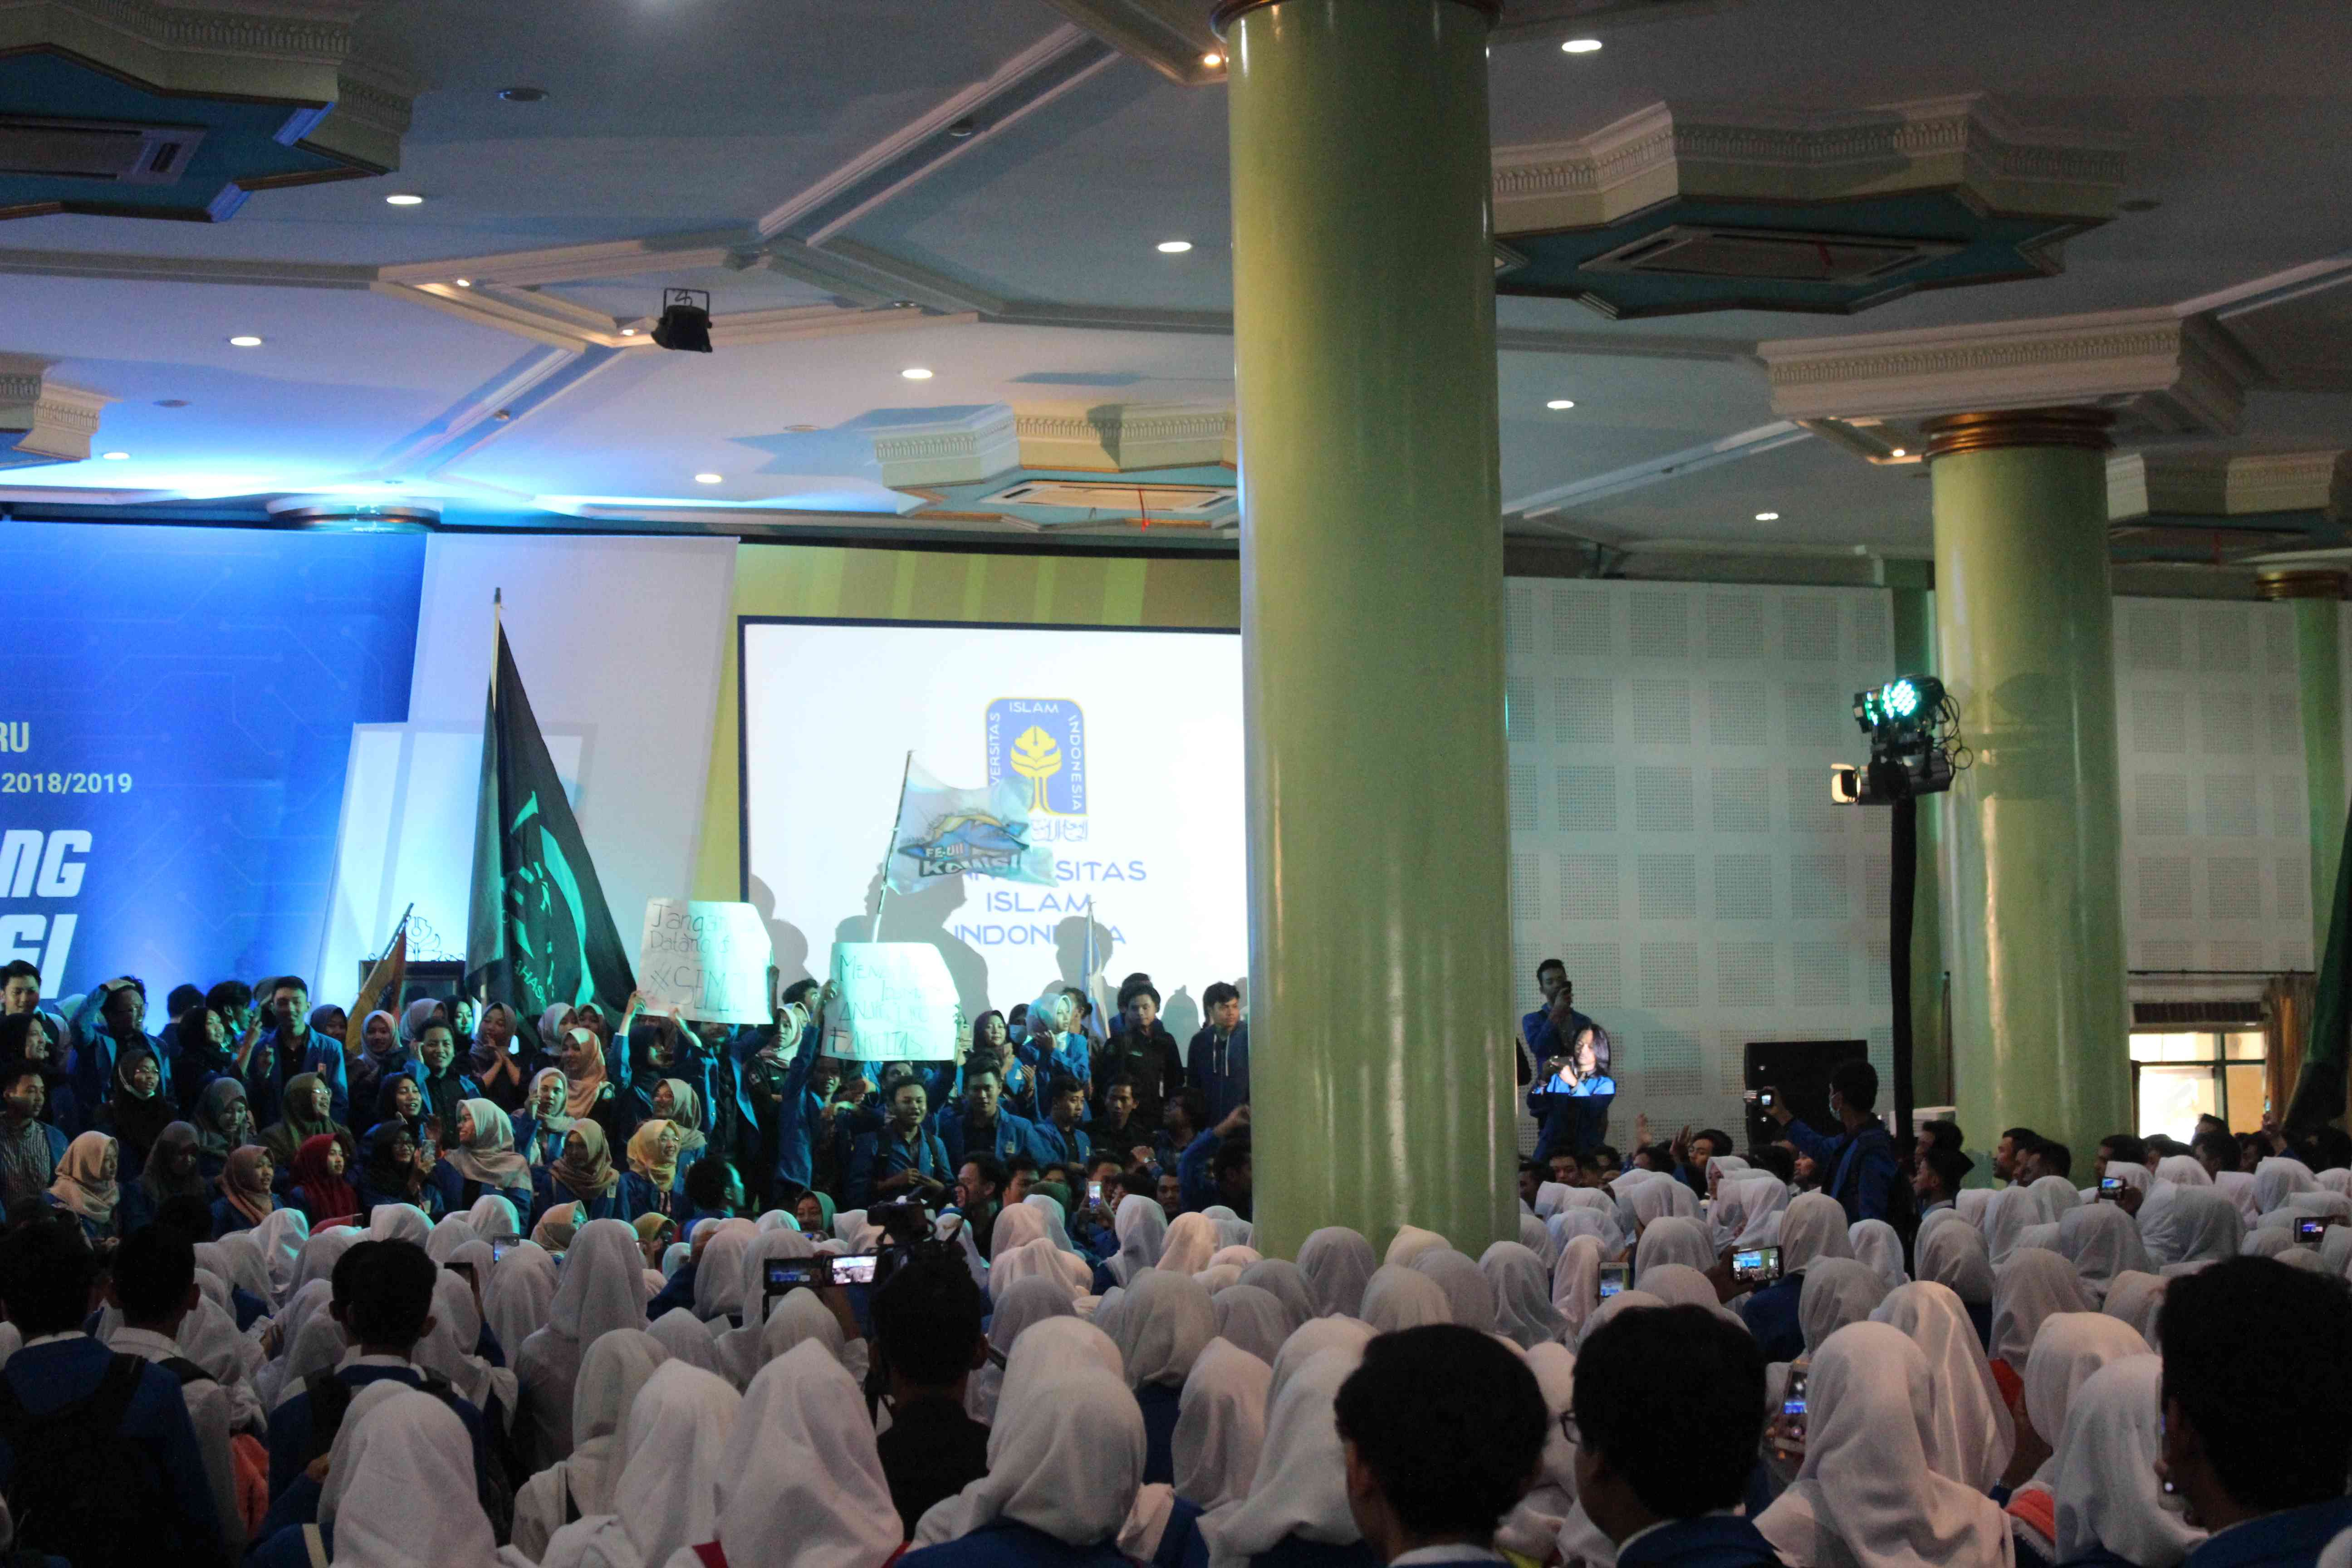 "Senin (13/08/2018) dilakukan penyambutan mahasiswa baru  Fakultas Ekonomi Universitas Islam Indonesia (FE UII) setelah kuliah perdana selesai oleh Keluarga Mahasiswa FE UII dengan meneriakkan yel-yel ""Ekonomi maju tuntaskan kemiskinan."" (Foto : Ghani/Ekonomika)"